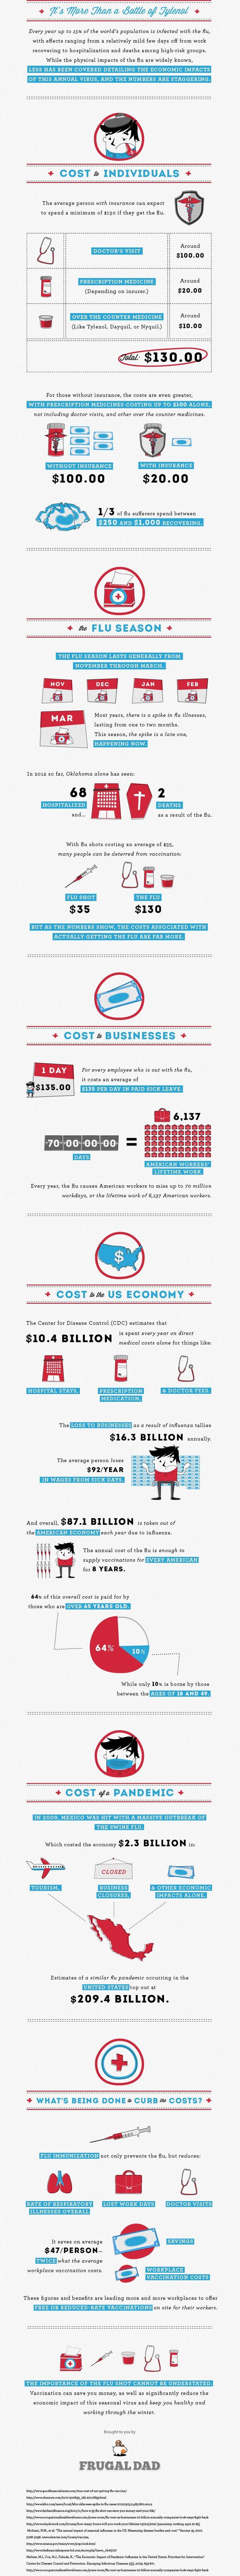 #cost #flu #healthcare